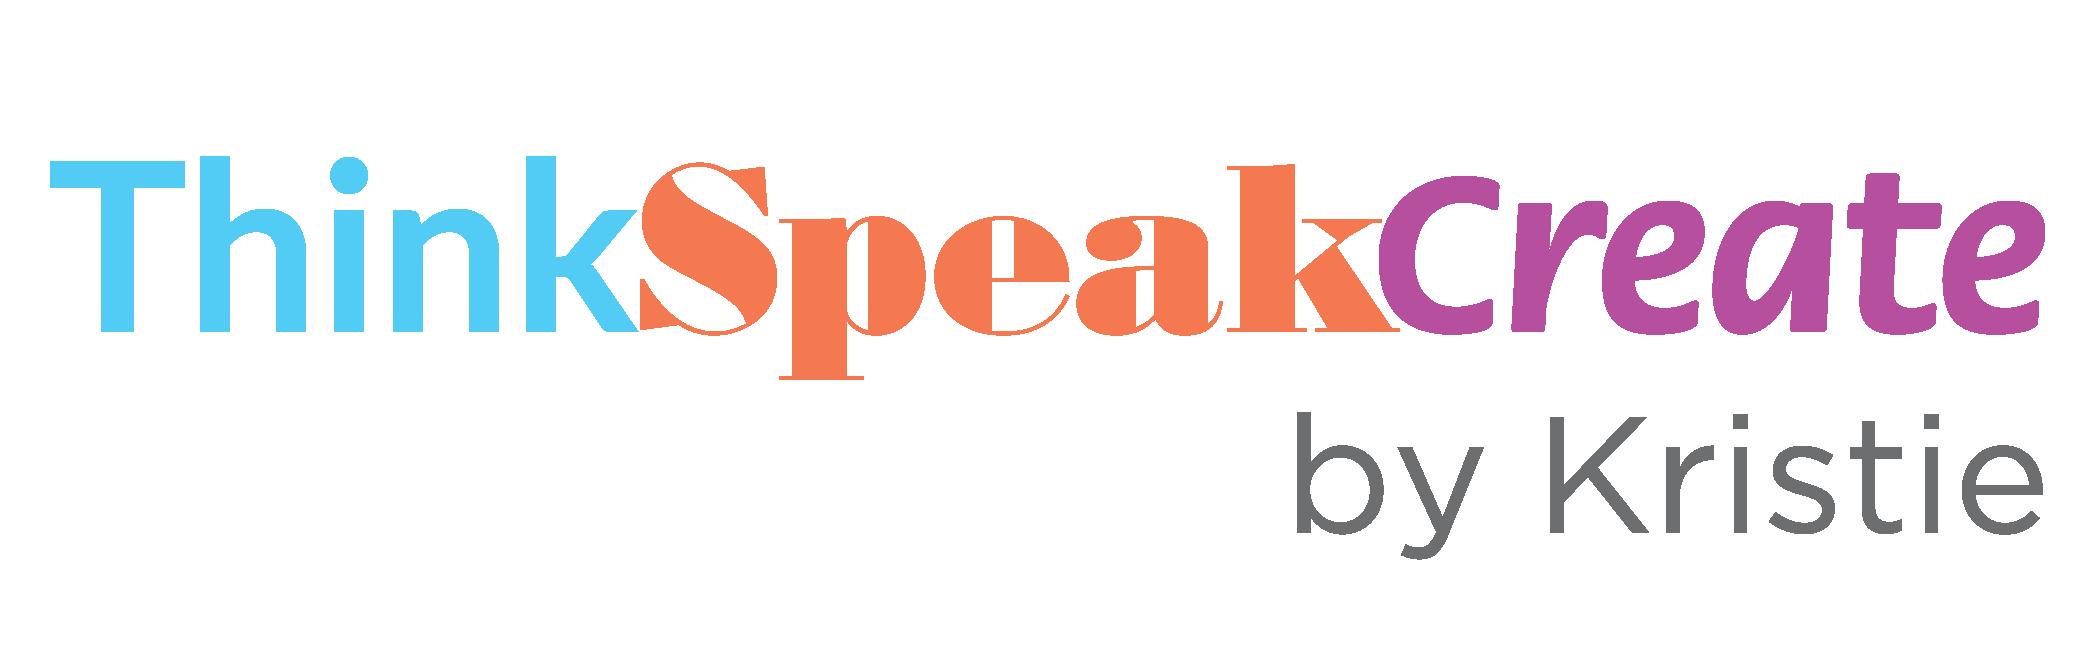 Kristie-think-speak-create logo.png